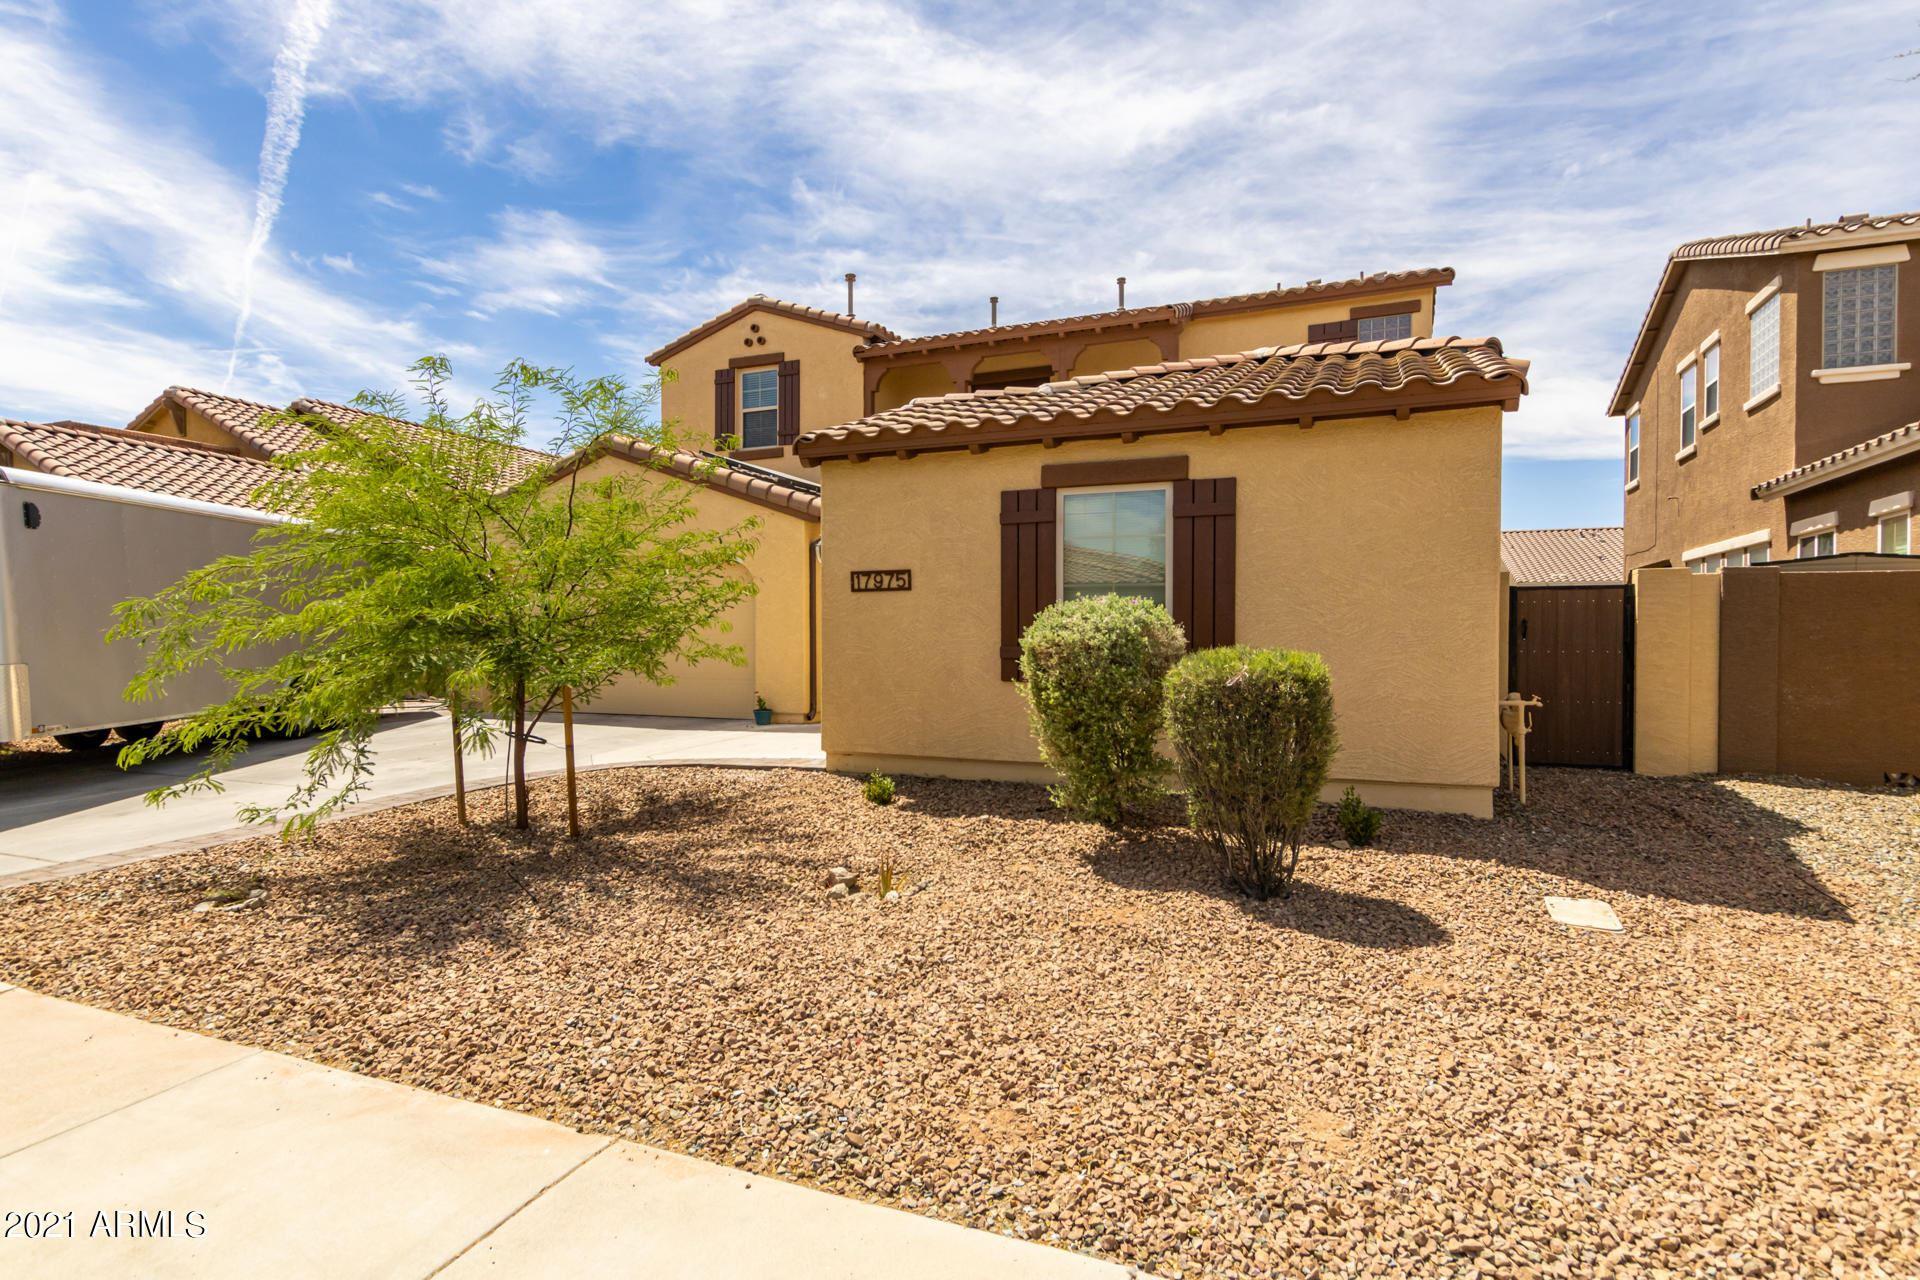 Photo of 17975 W AGAVE Road, Goodyear, AZ 85338 (MLS # 6249327)